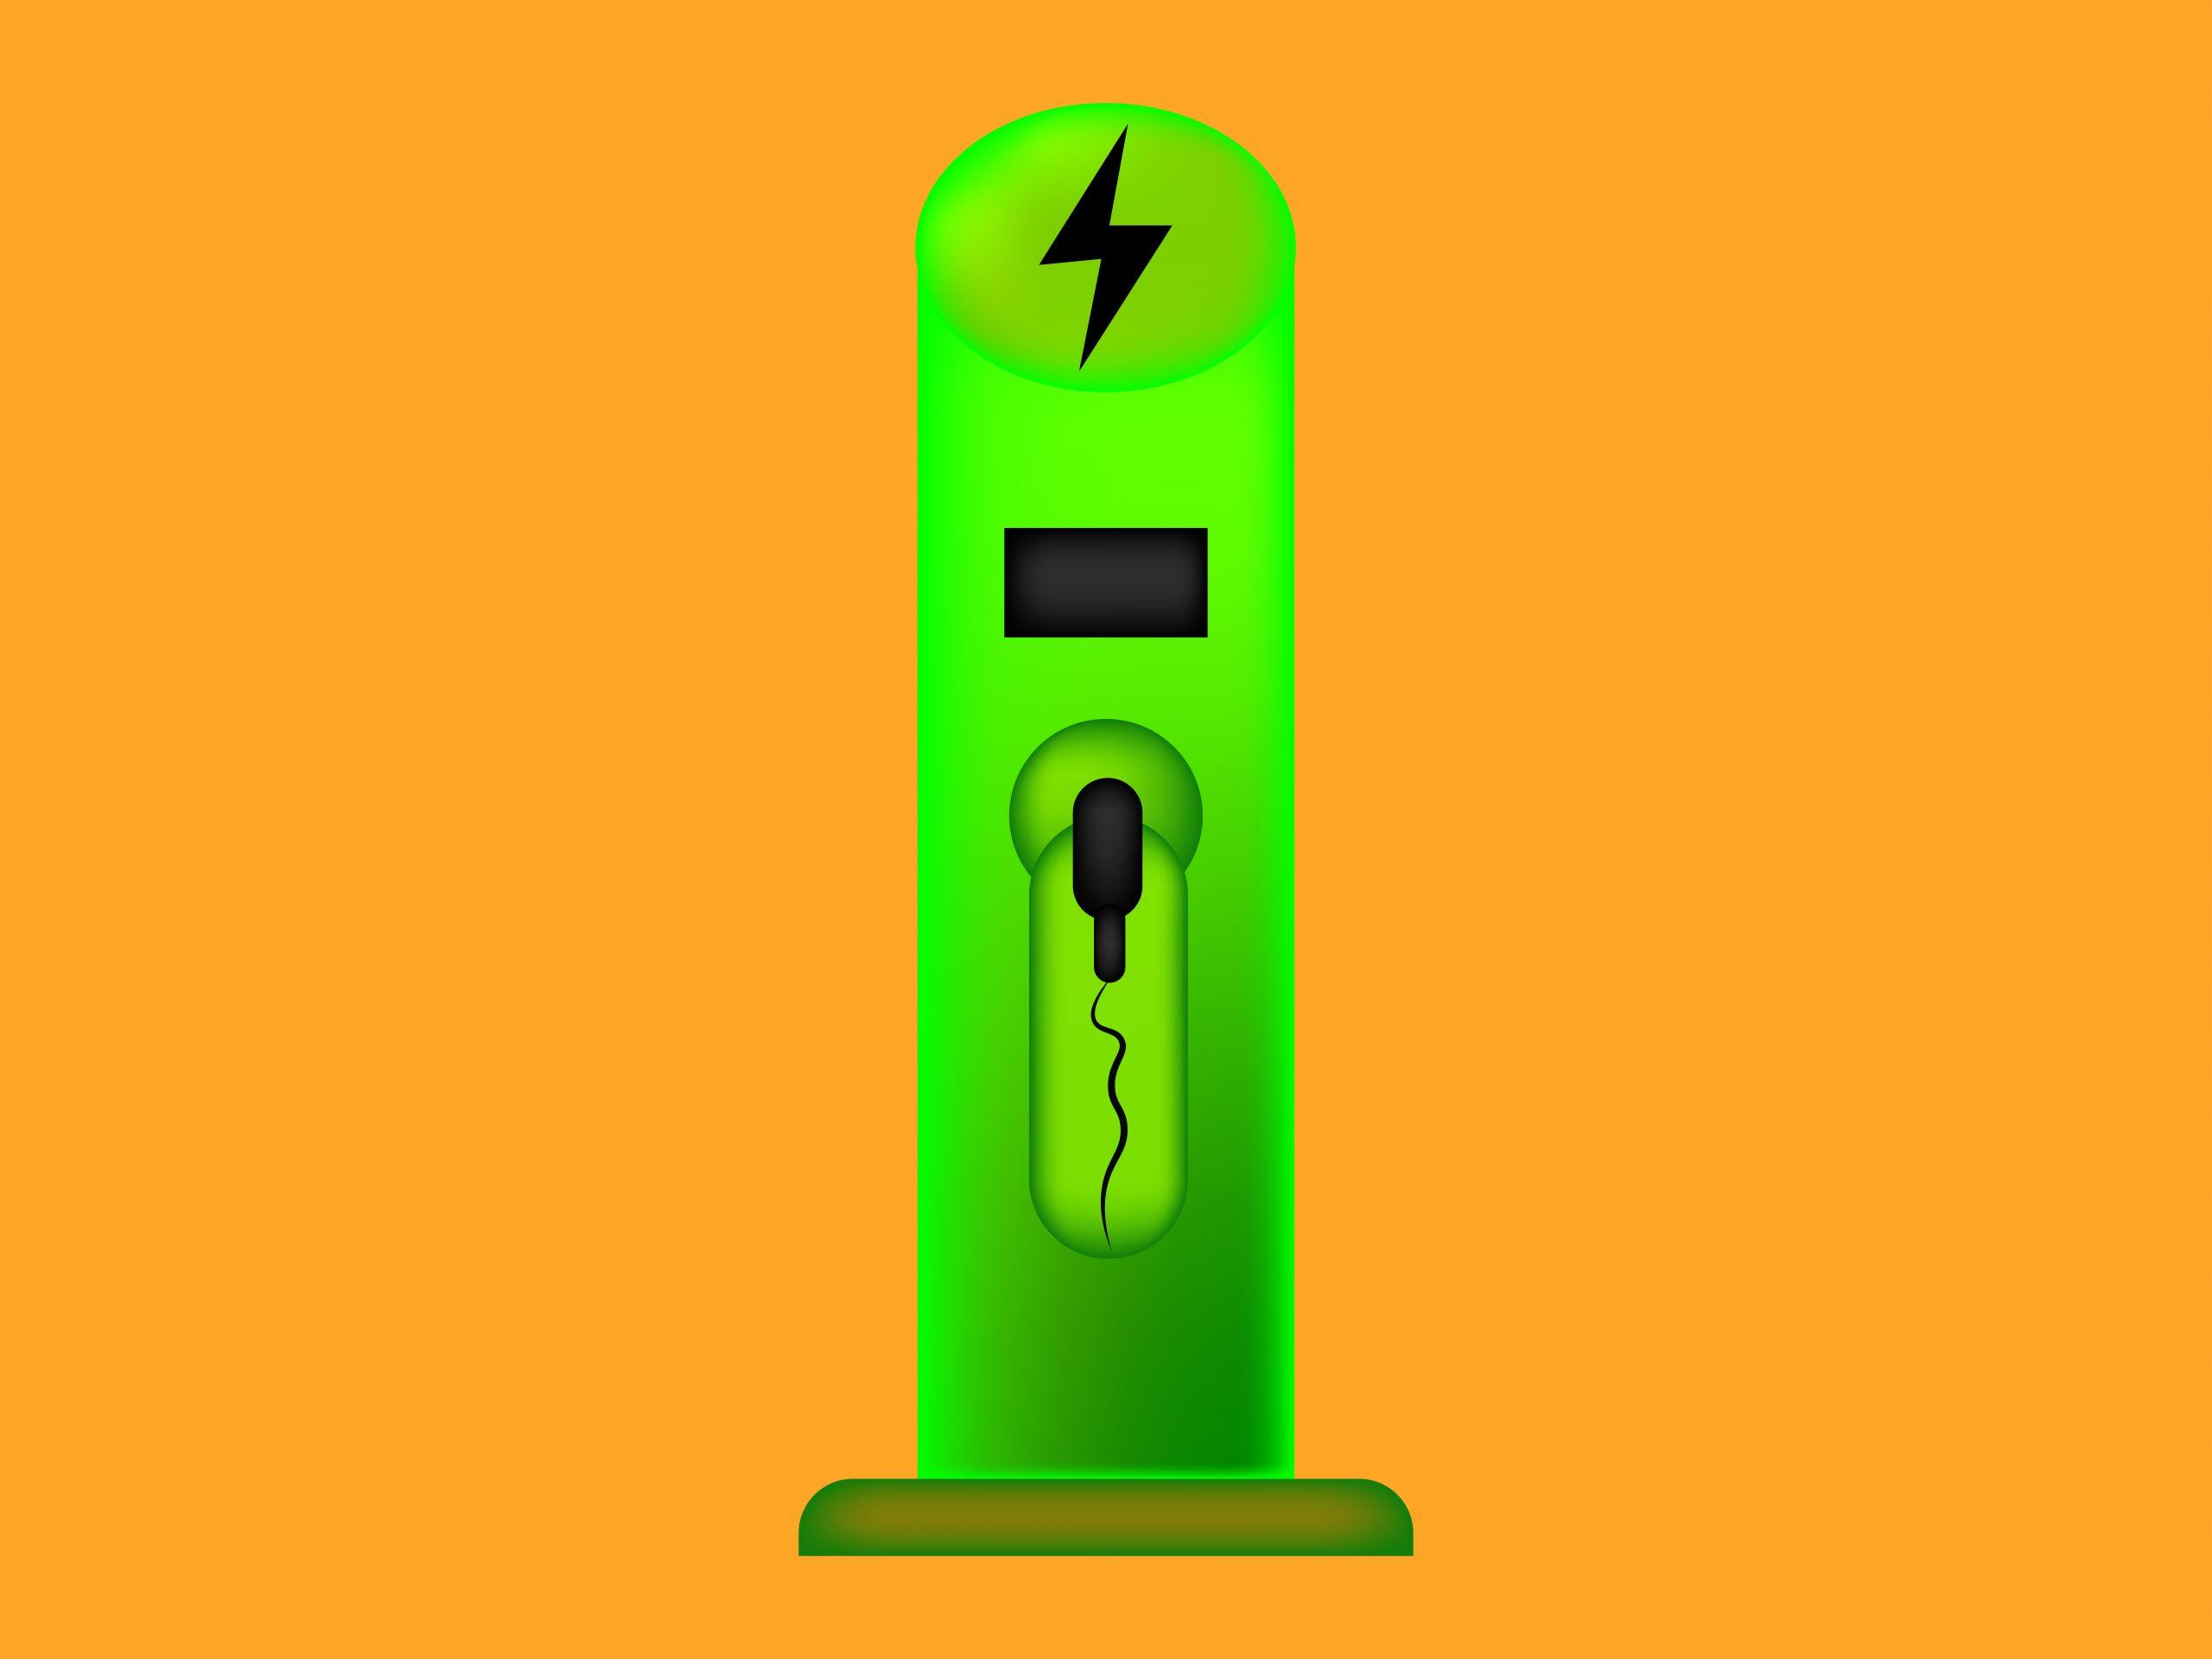 charging-station illustration